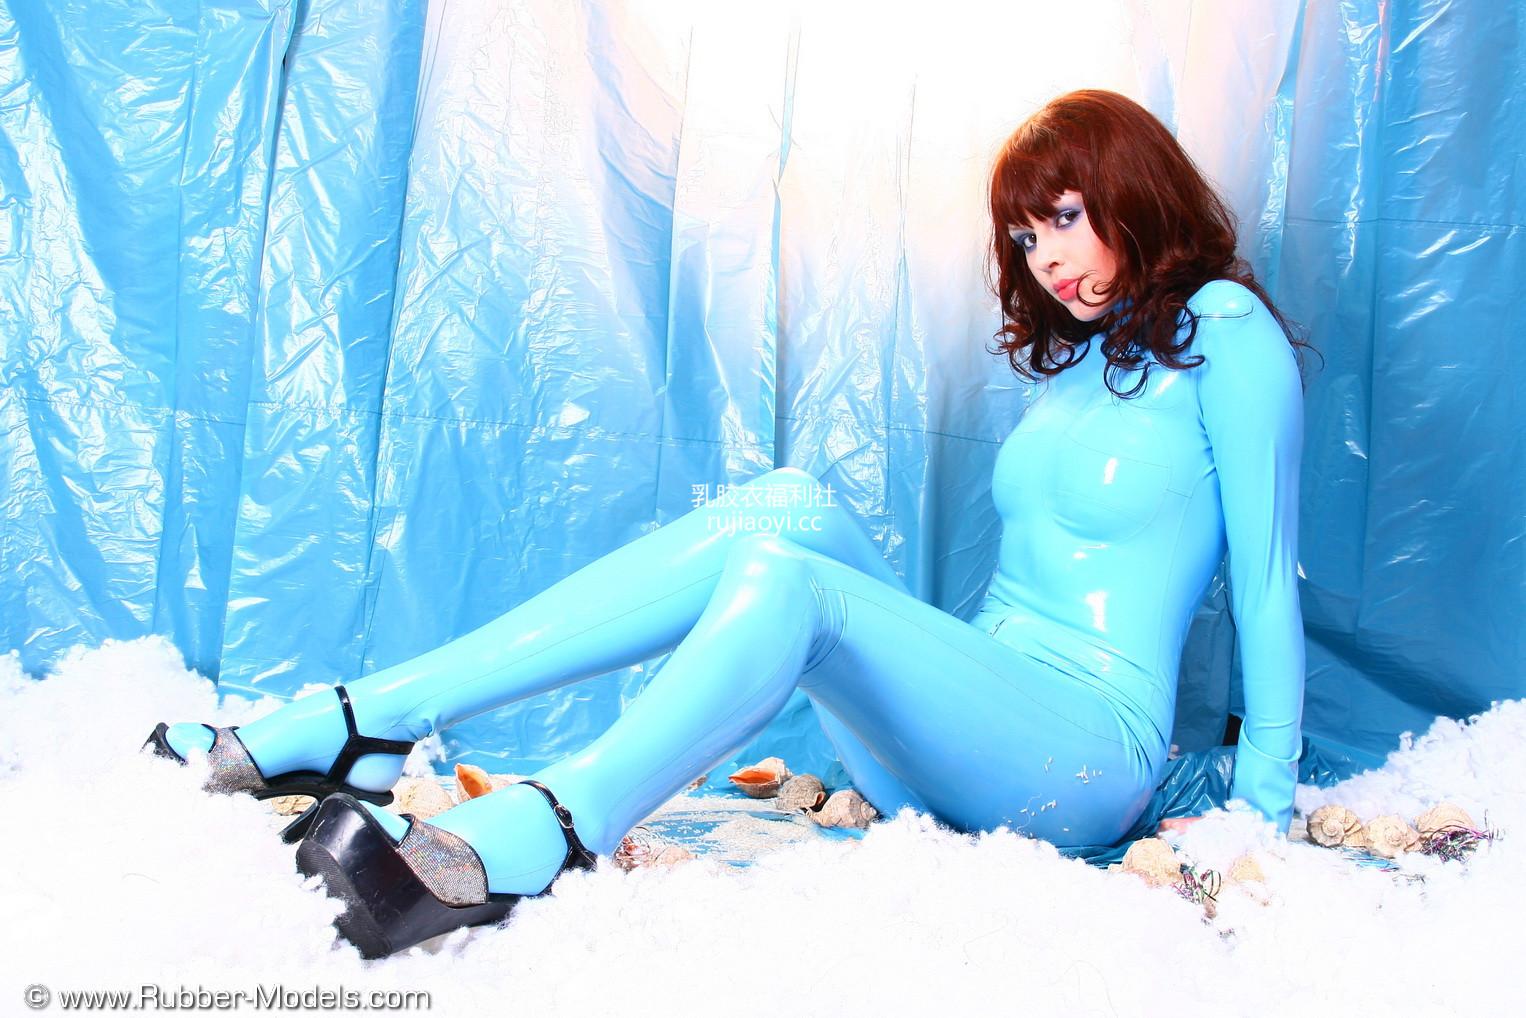 [RubberModels] 亮蓝色乳胶衣少女摆出不同姿势